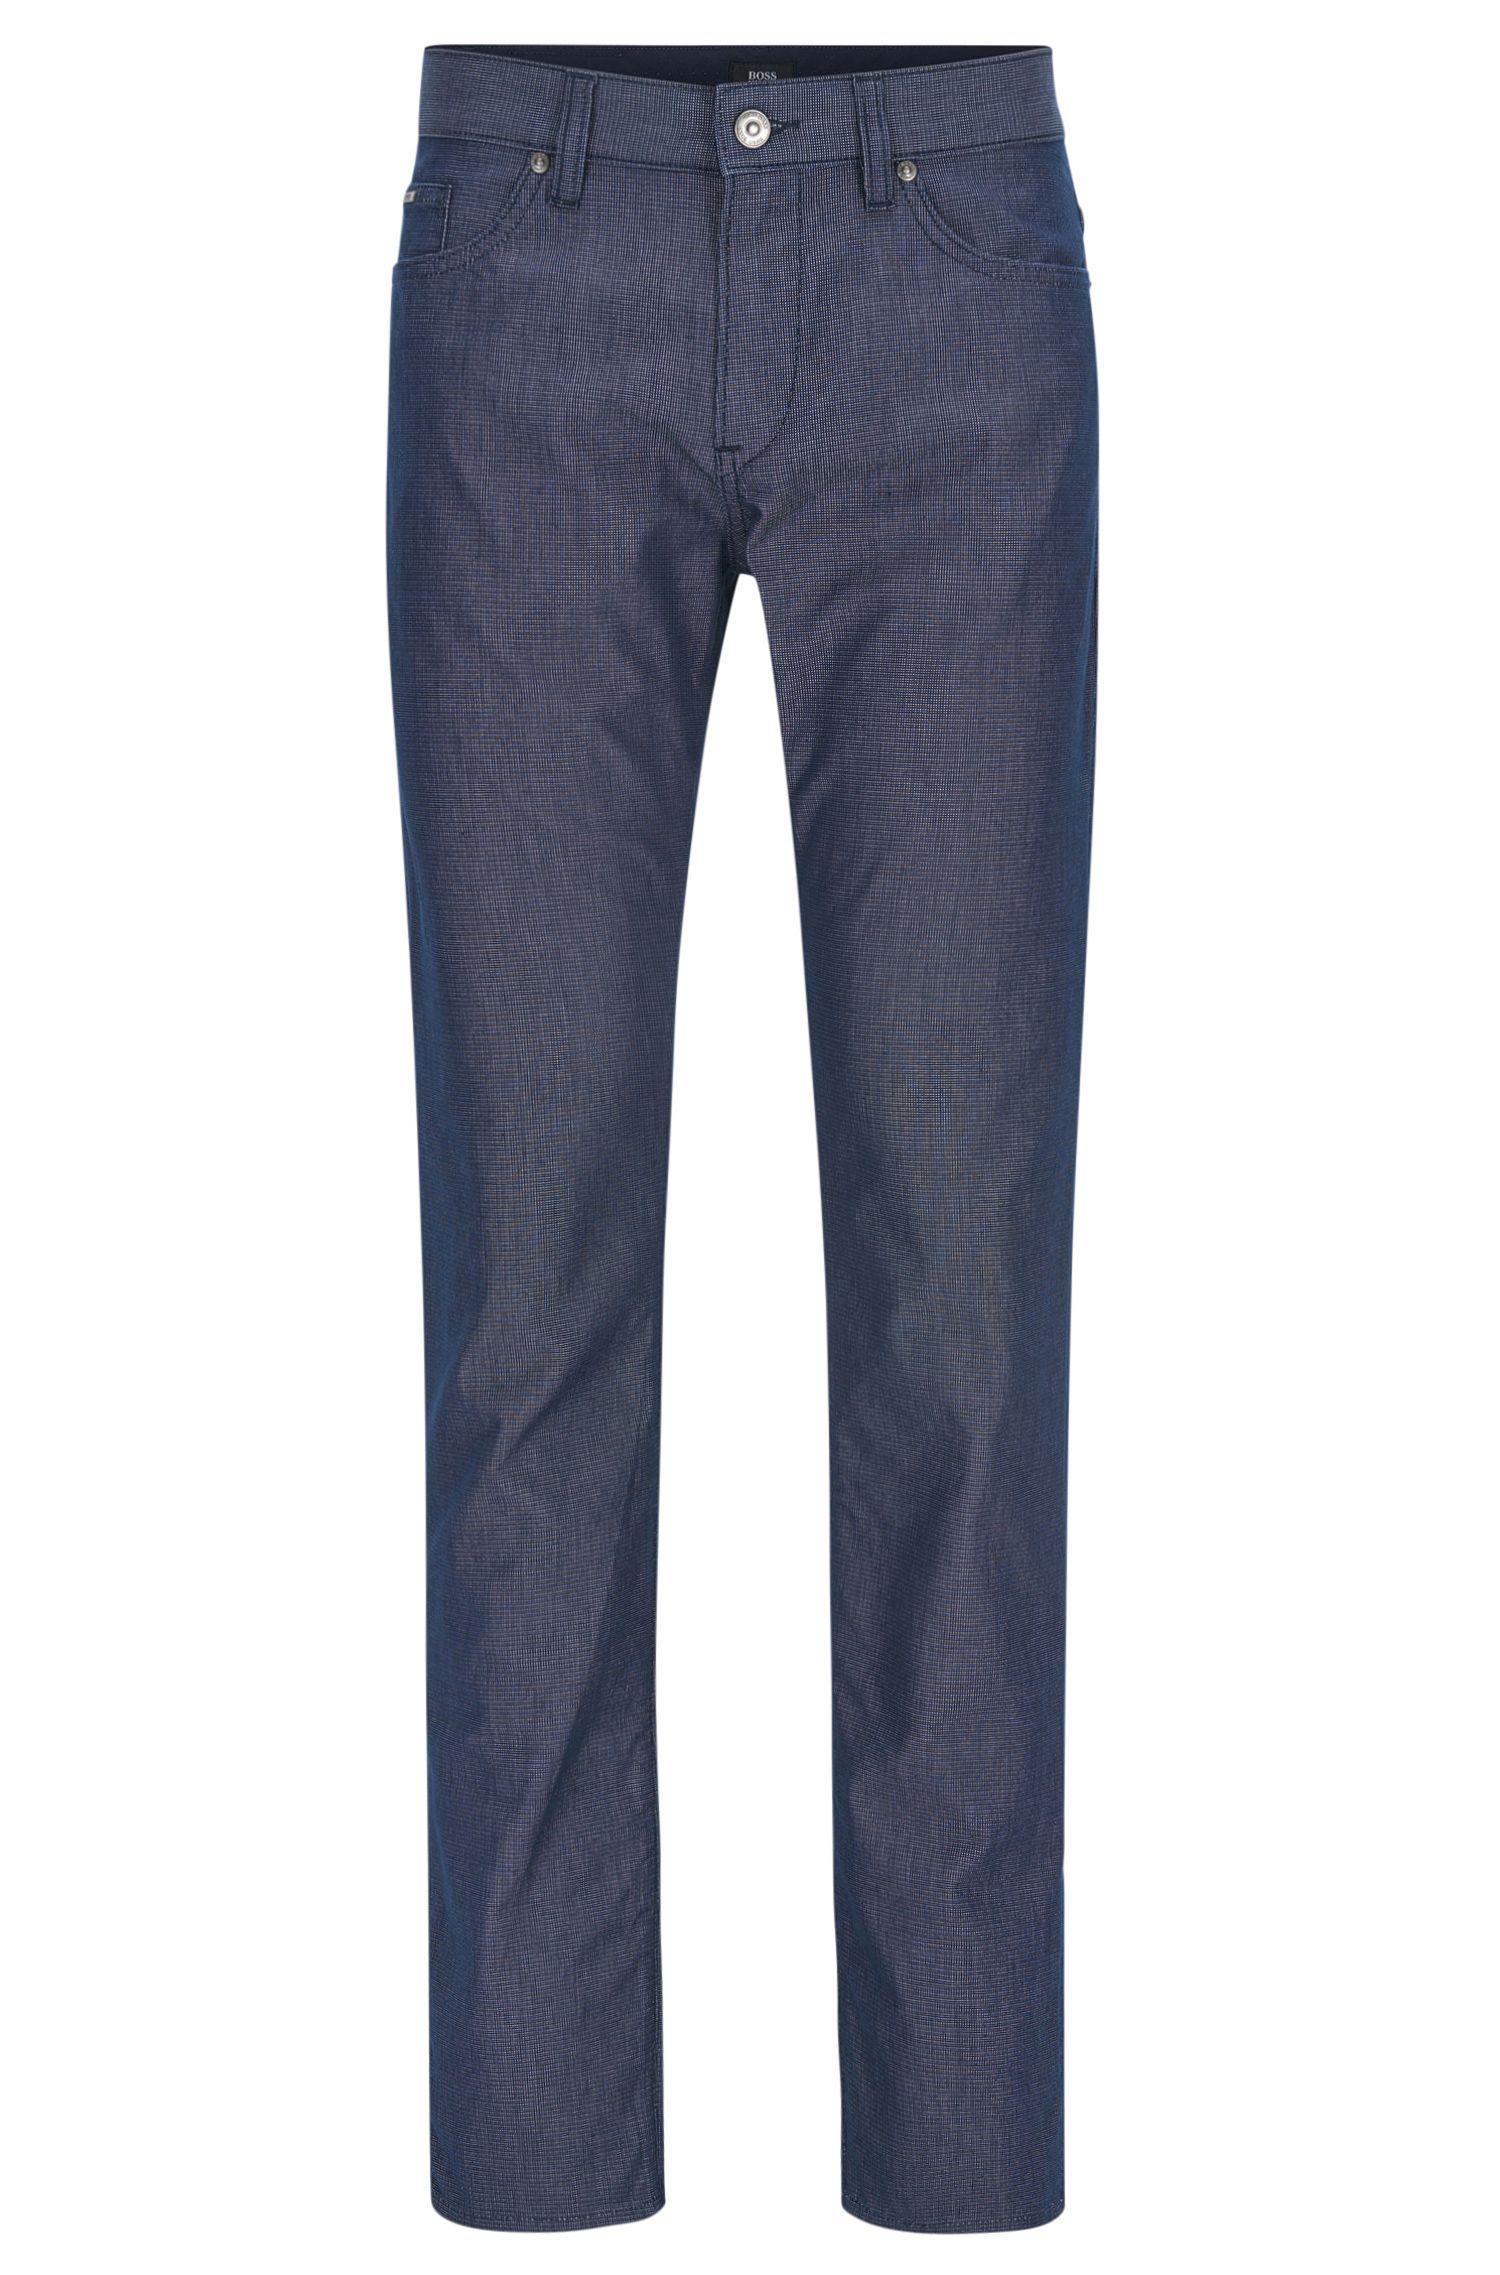 Basketweave Stretch Cotton Pant, Slim Fit | Delaware